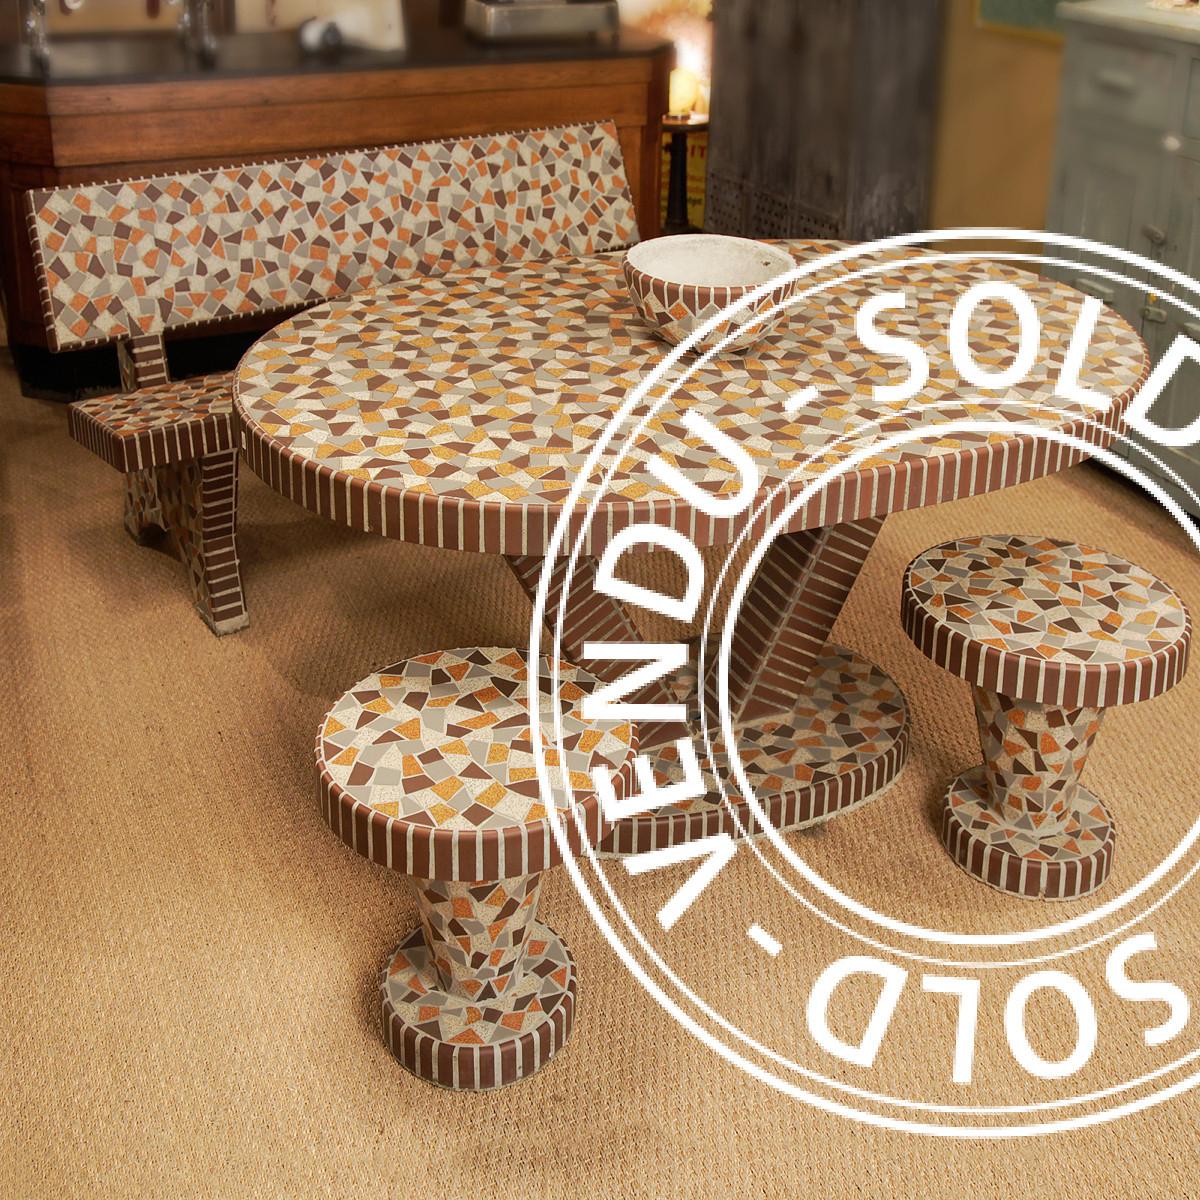 Sold - Garden Lounge In Concrete Mosaïc - Table, Coffee ... dedans Salon Jardin Mosaique